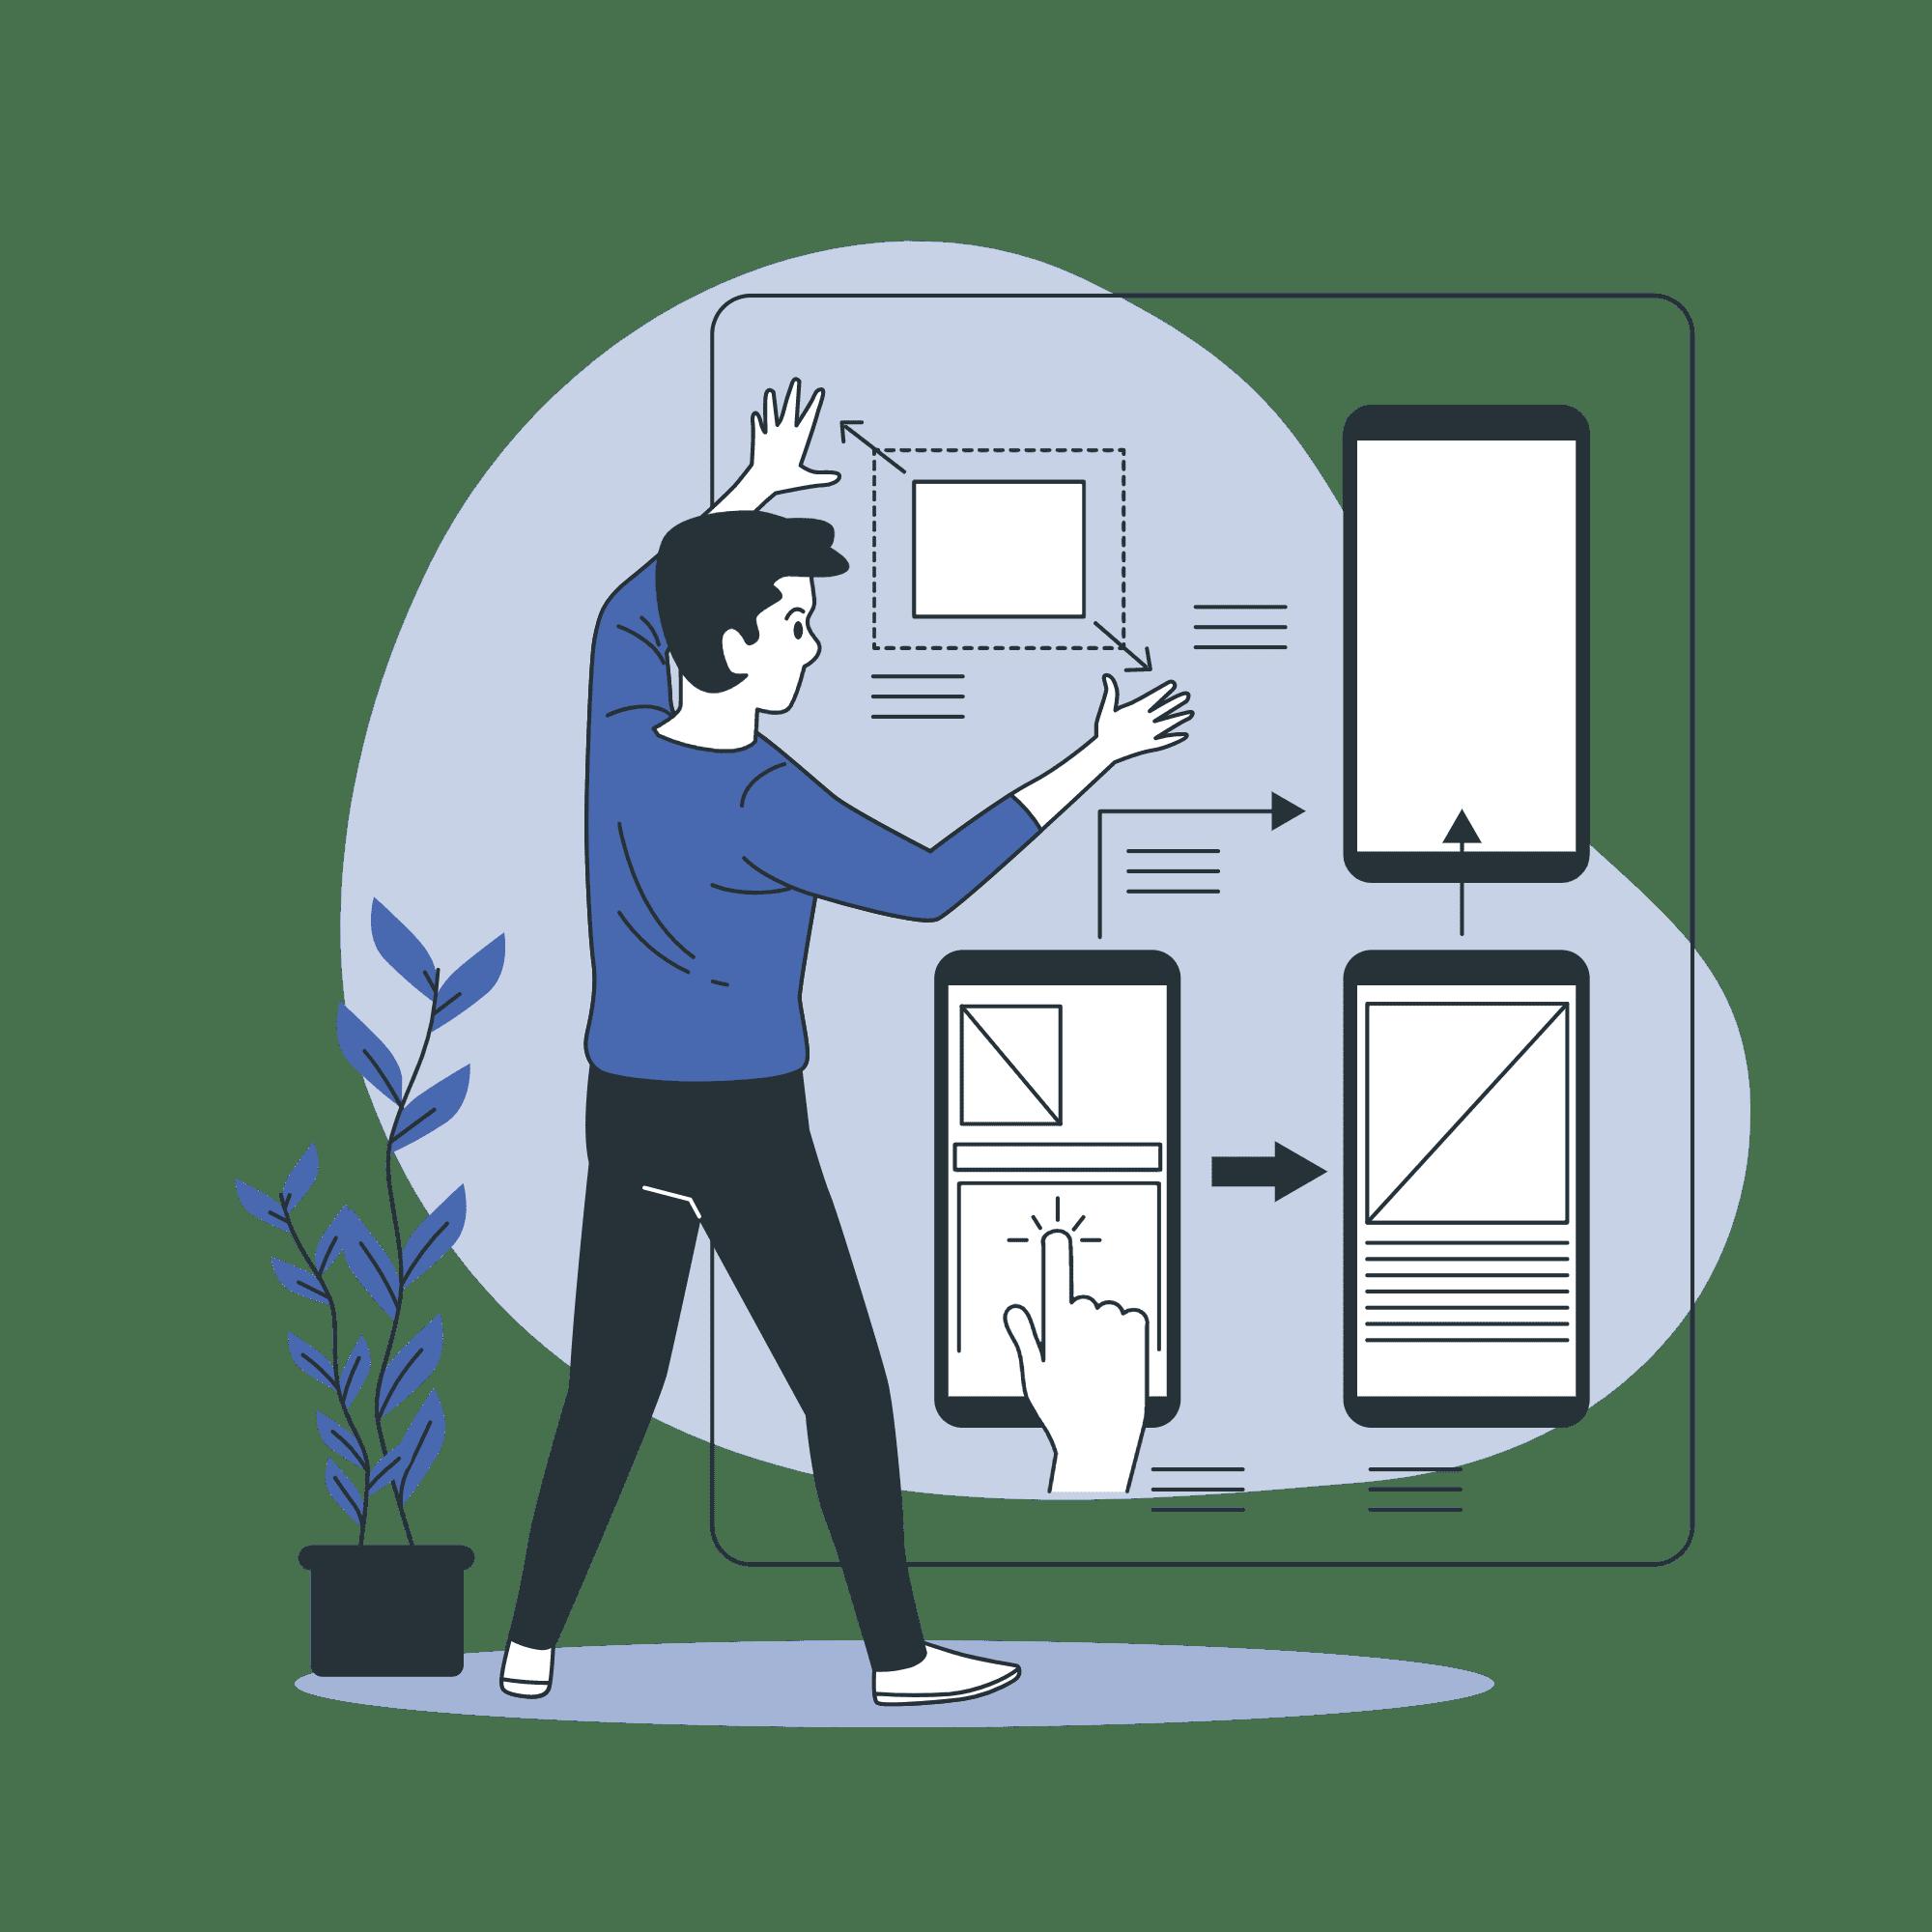 Mobile Design Vector illustration